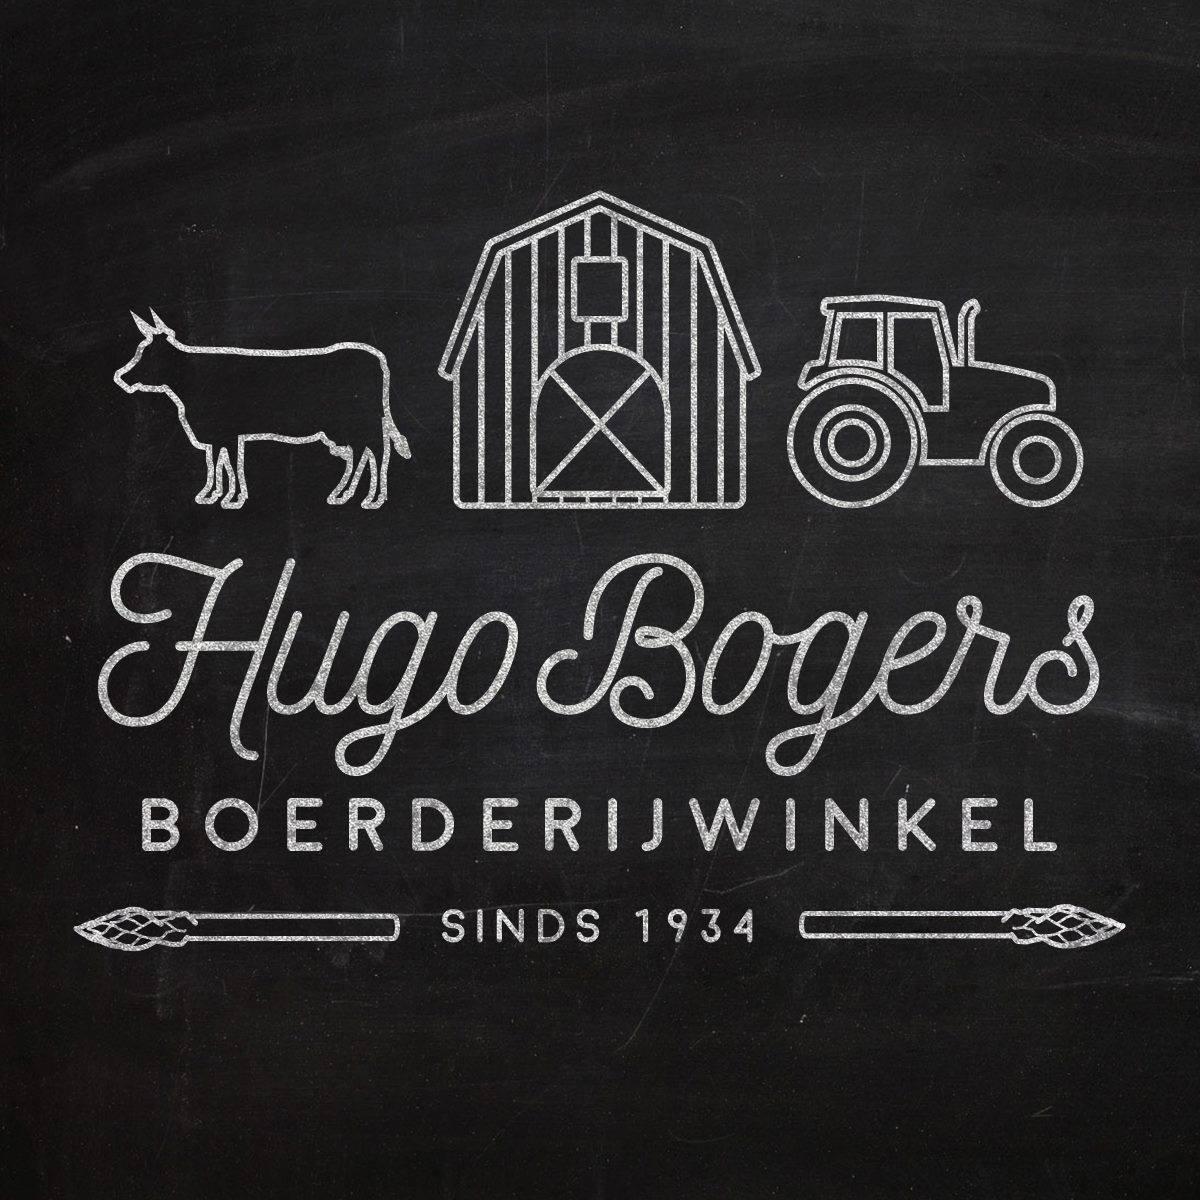 Hugo Bogers Boerderijwinkel